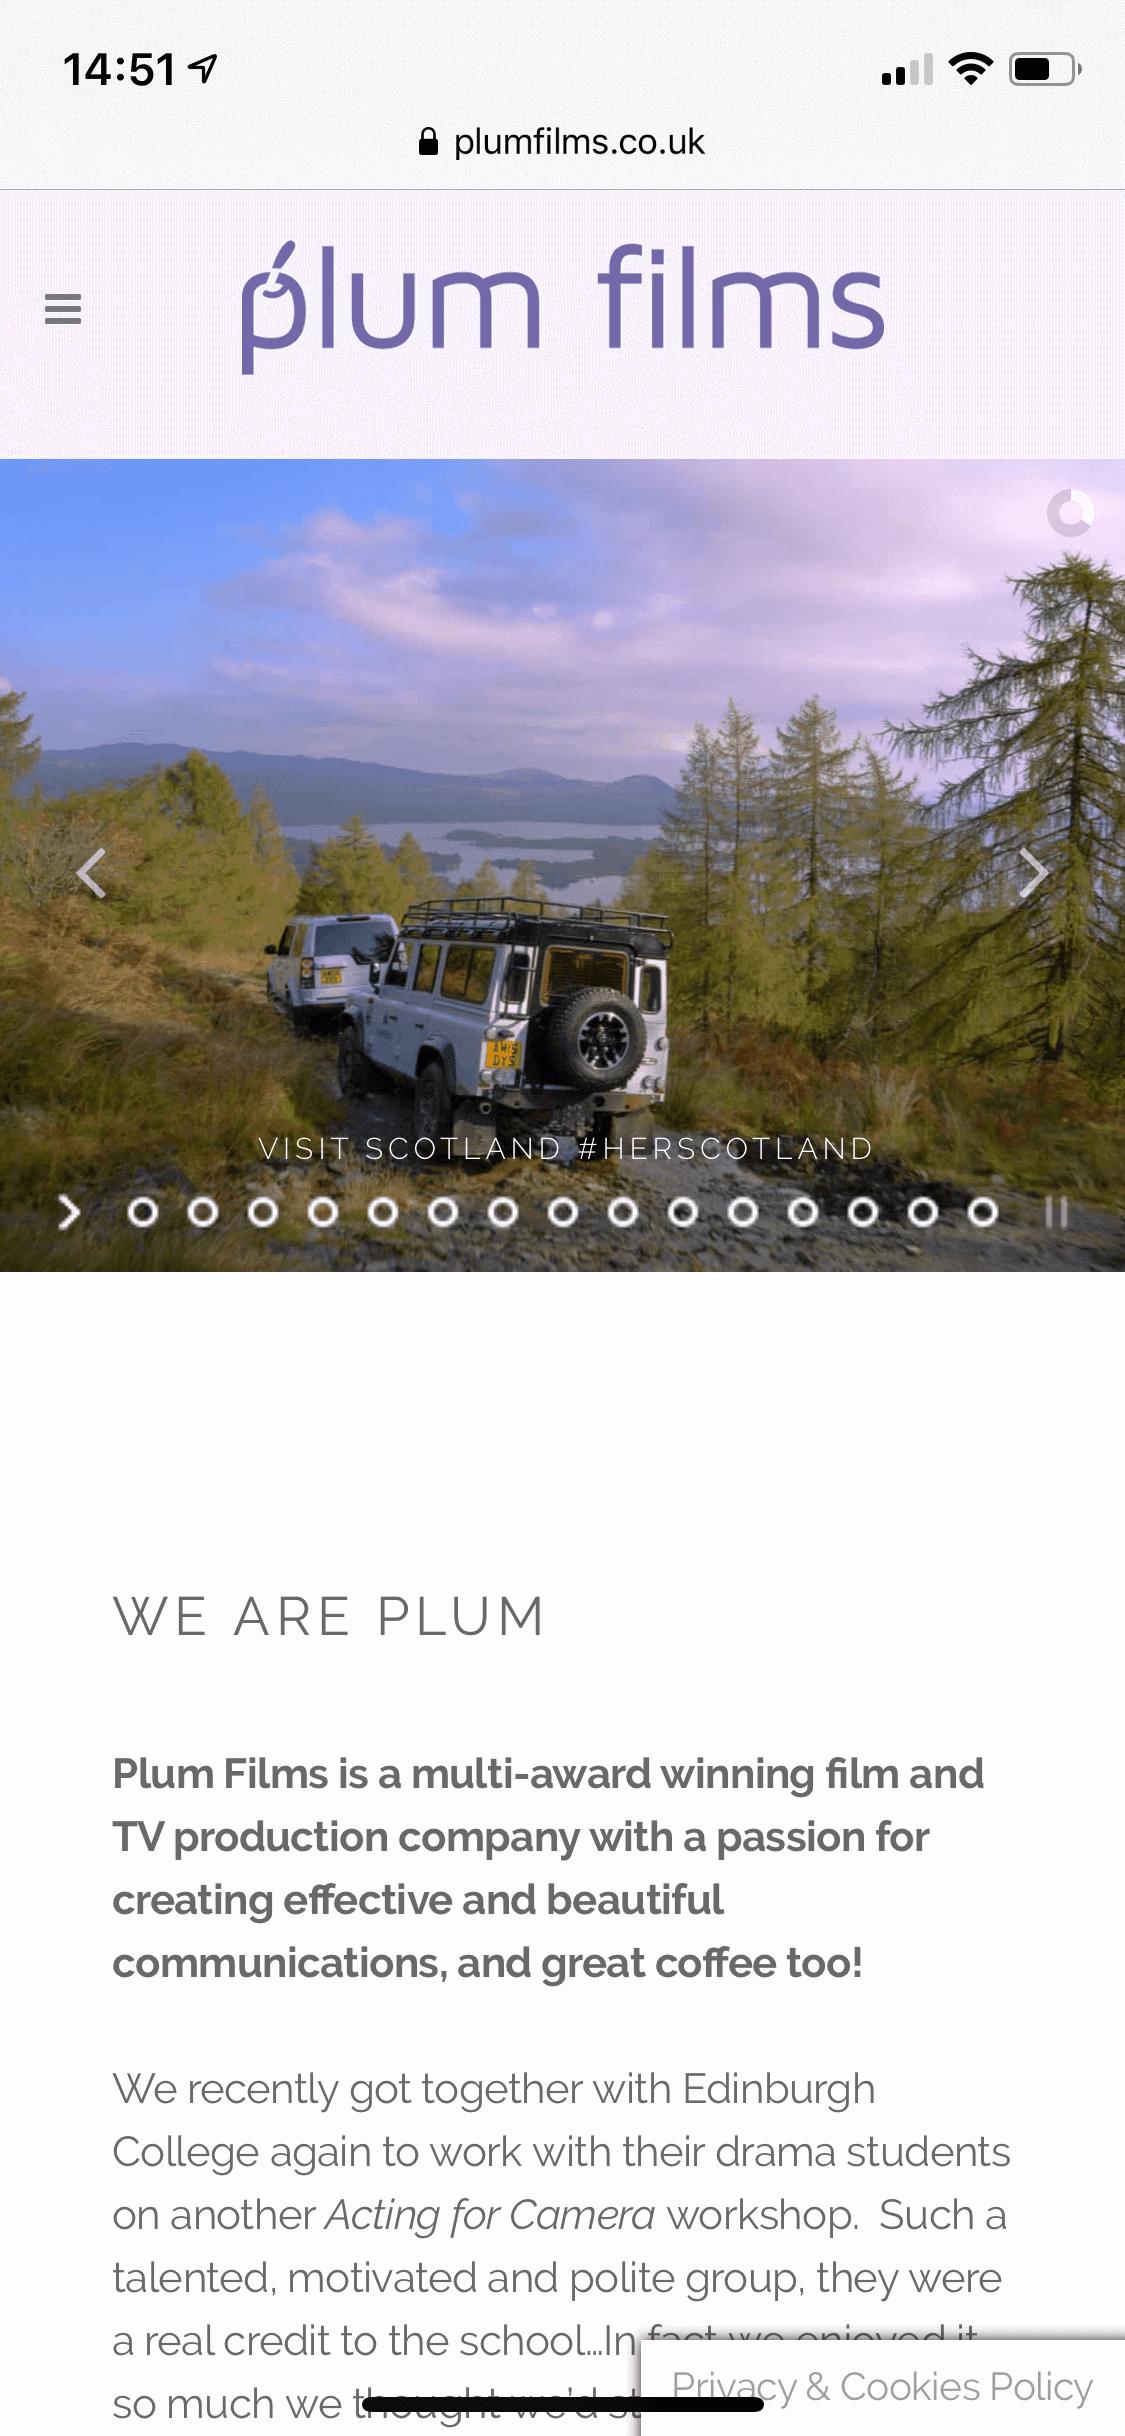 Plum films mobile